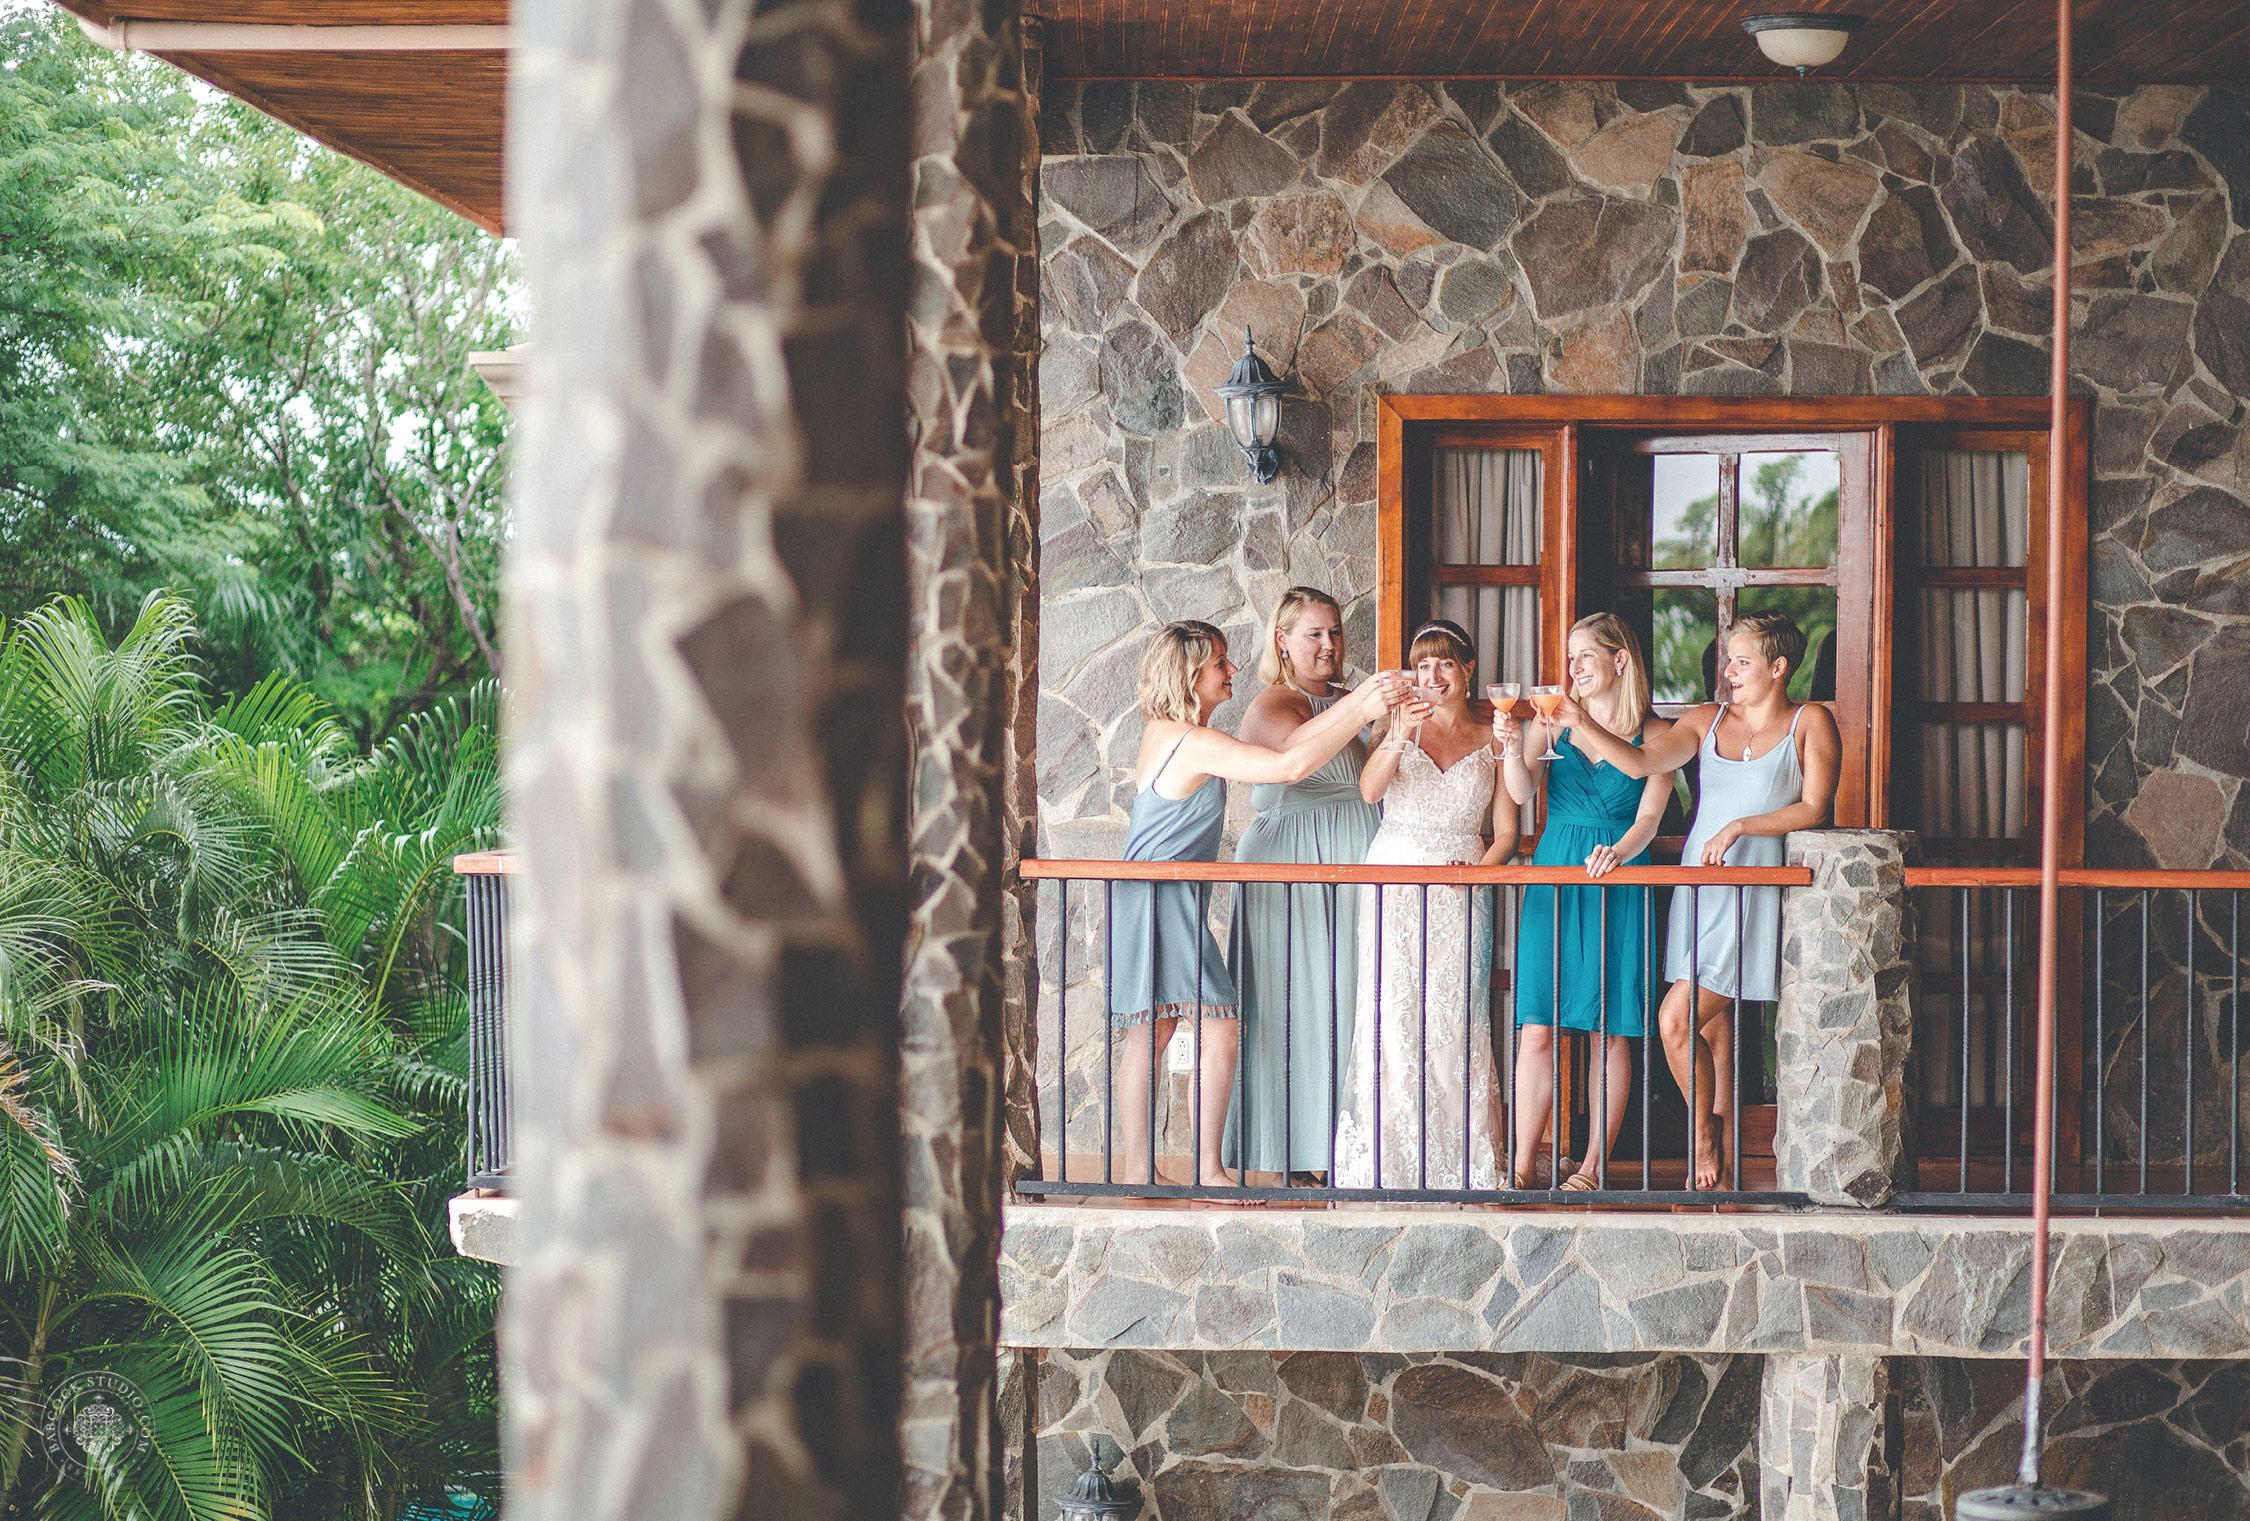 2cat-brandon-costa-rica-destination-wedding-photographer-dayton-ohio-7.jpg